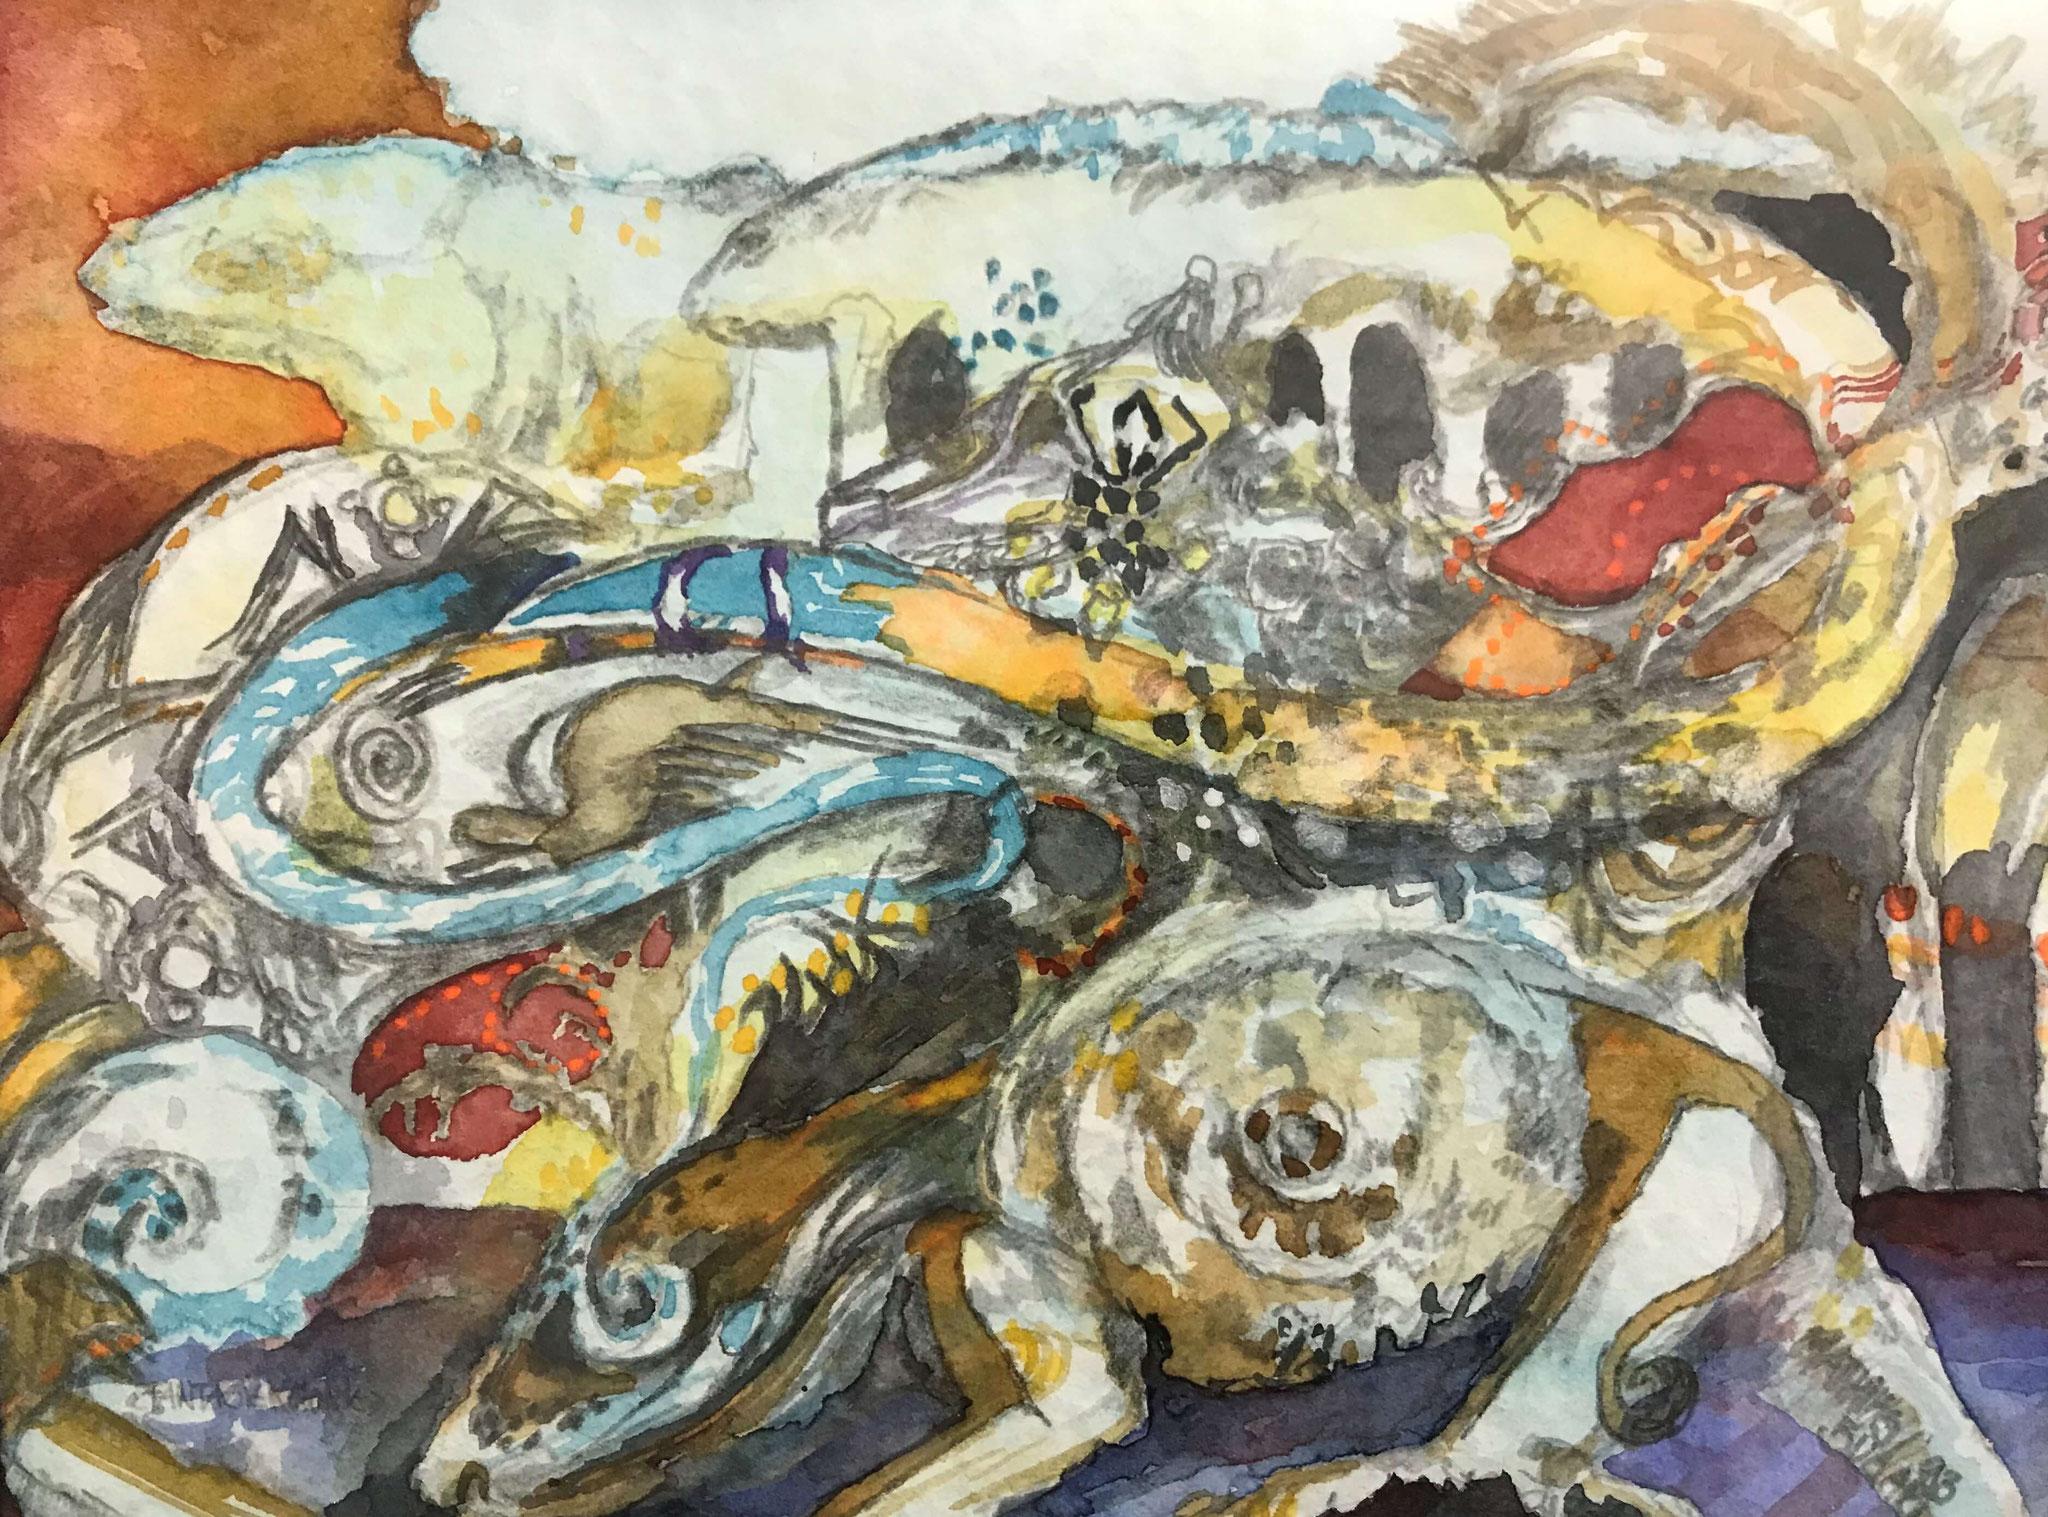 Fr. 350.00 Mathias Bugari, Aquarelle auf Papier mit Rahmen 20 x 15 cm.